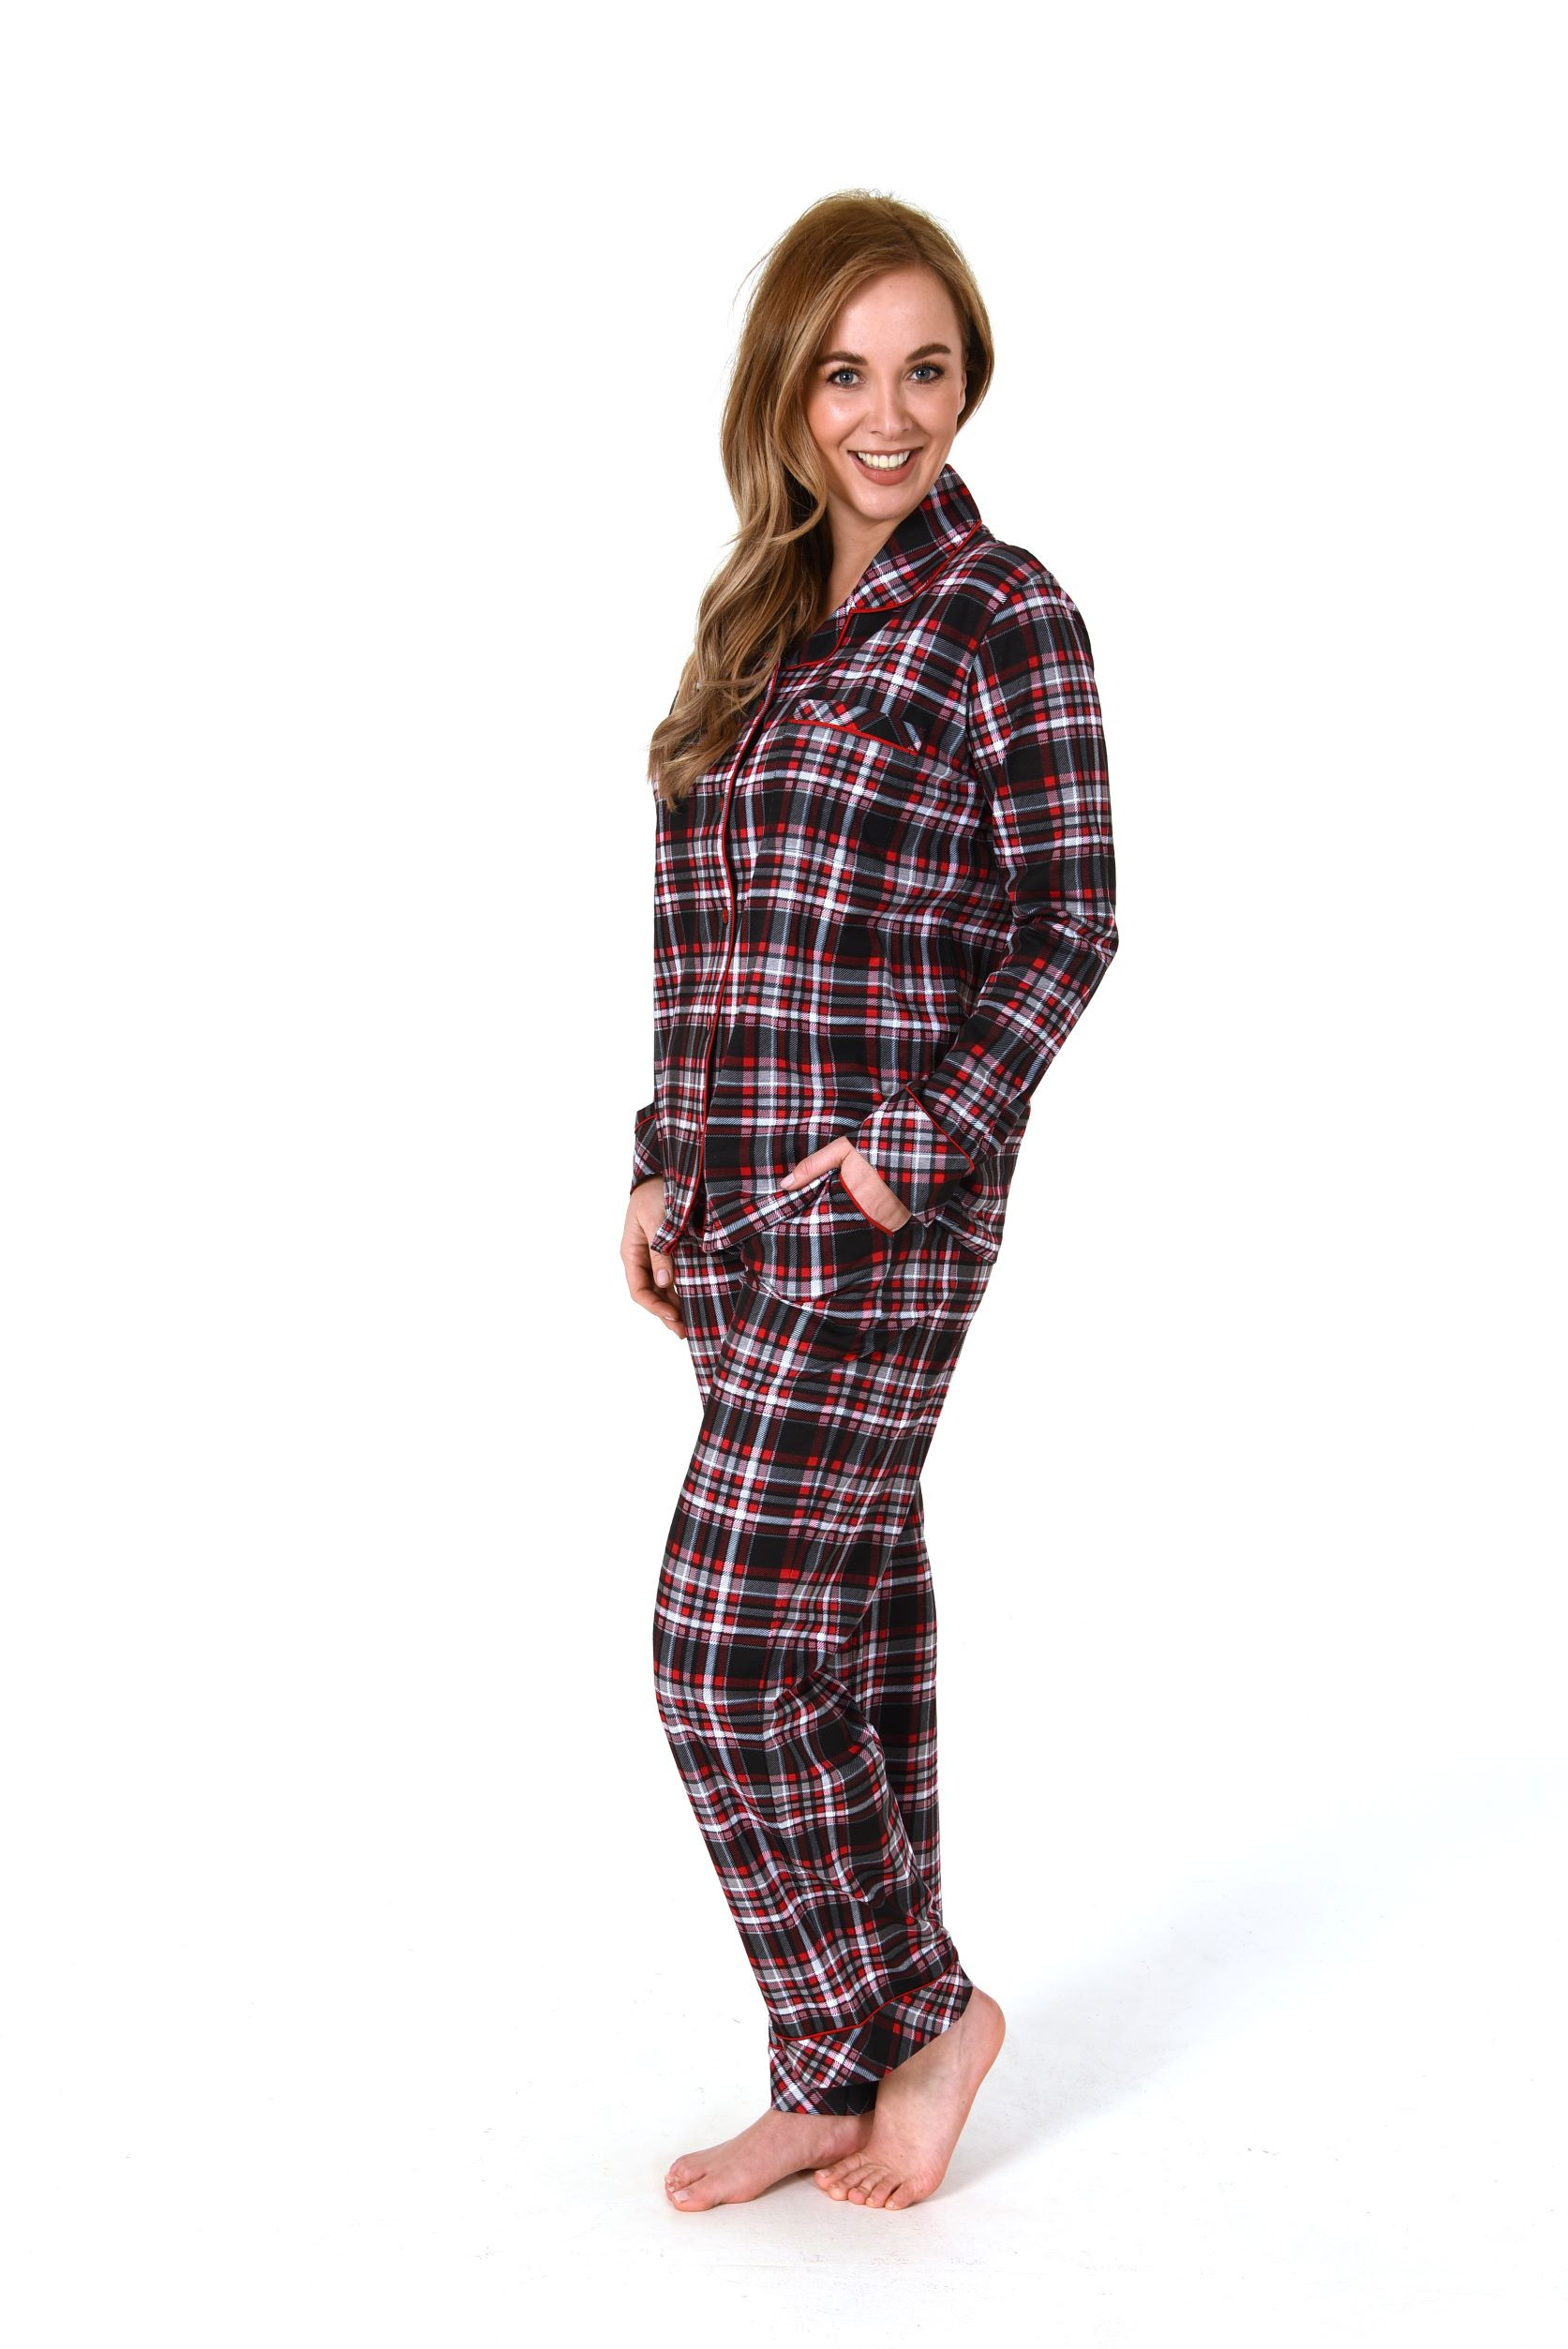 Norman dames pyjama flanel 201 90821-M 40/42